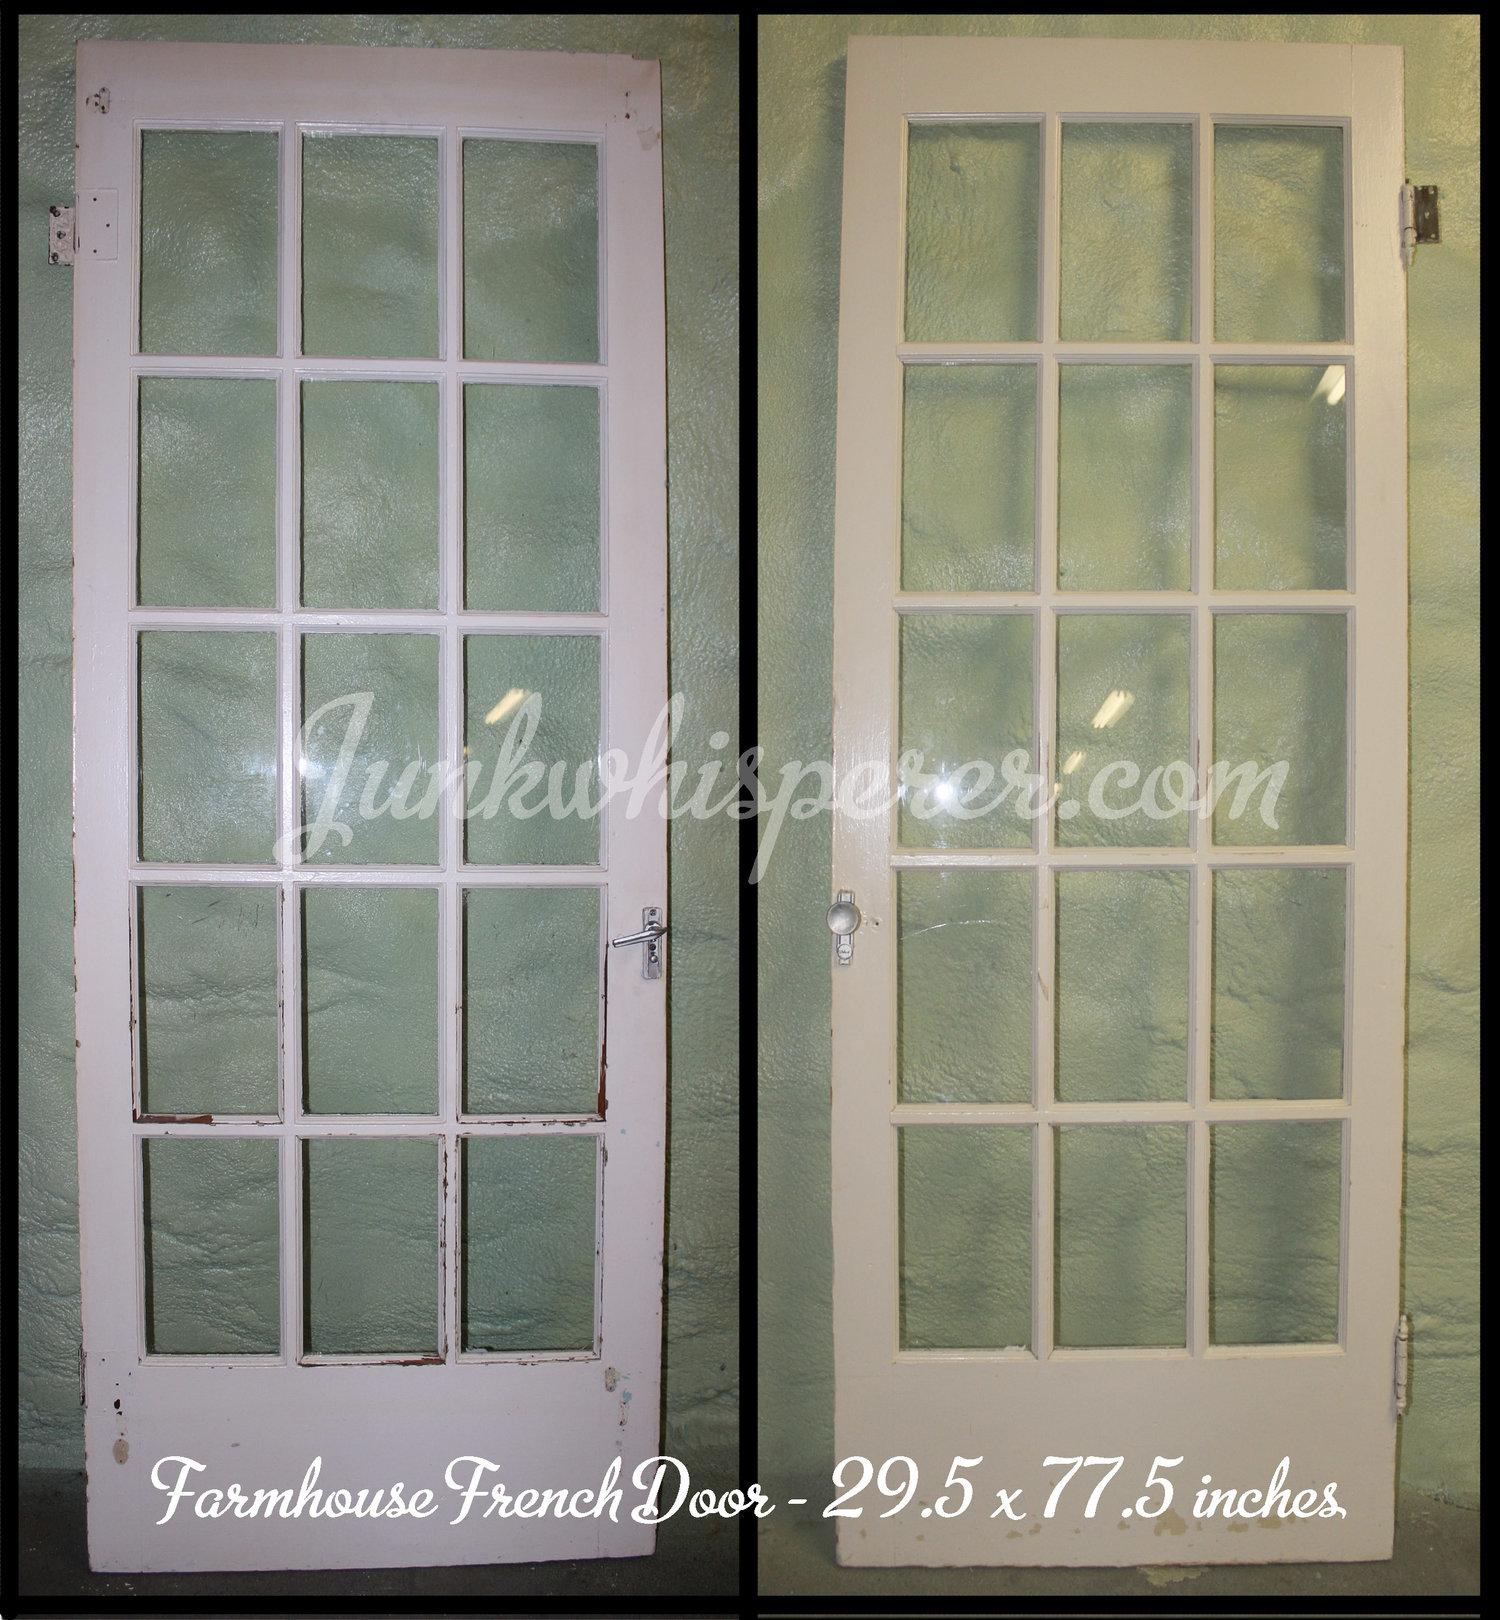 Vintage farmhouse doors with windows junk whisperer prev next rubansaba